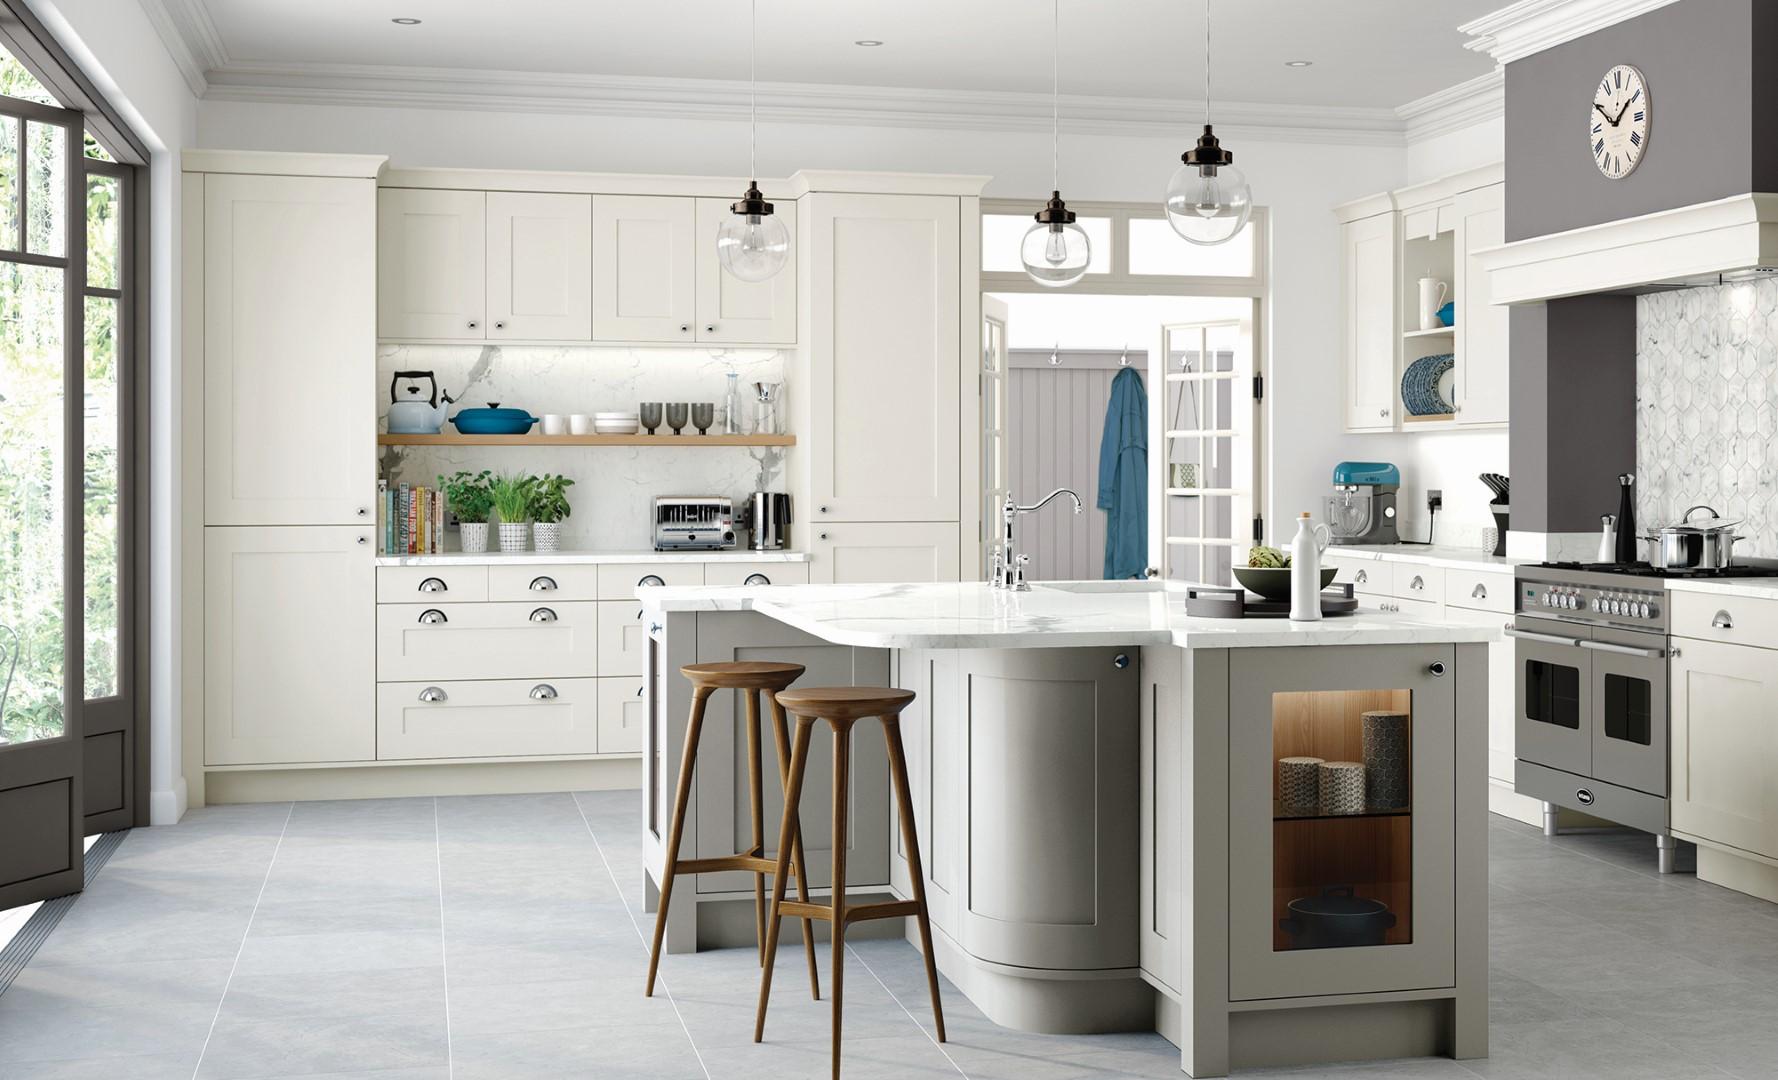 Classic Traditional Kitchen - Georgia Painted Porcelain Stone - Kitchen Design - Alan Kelly Kitchens - Waterford